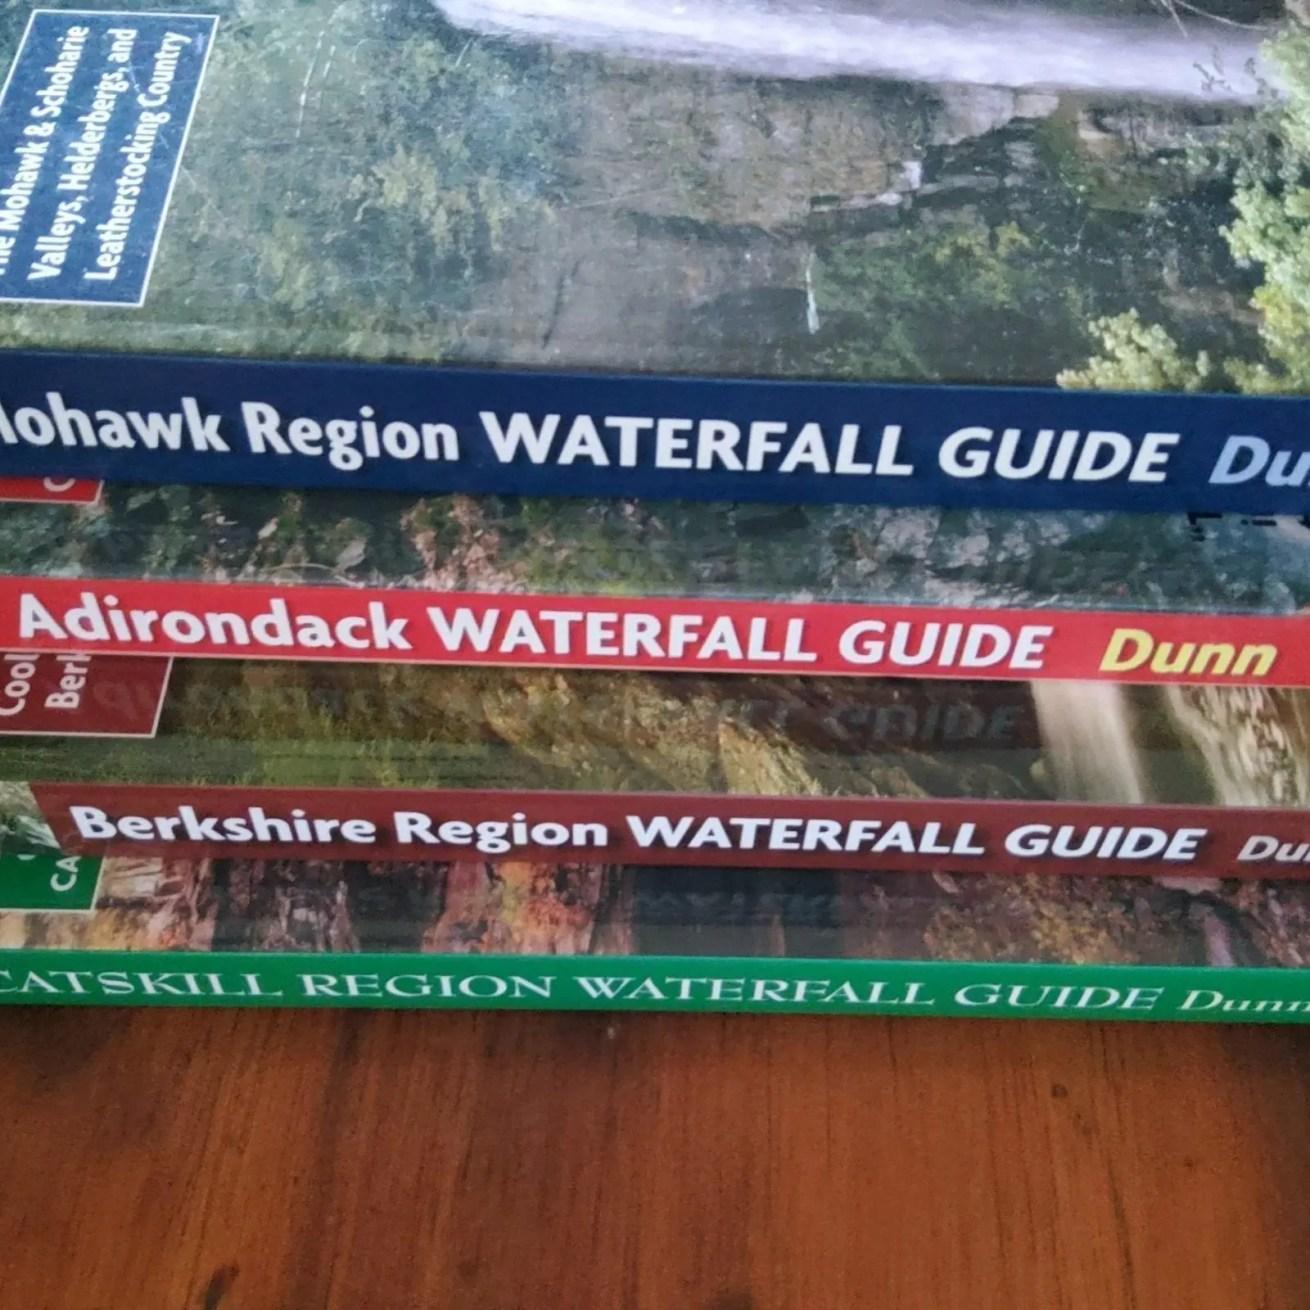 Russell Dunn Regional Waterfall Guides